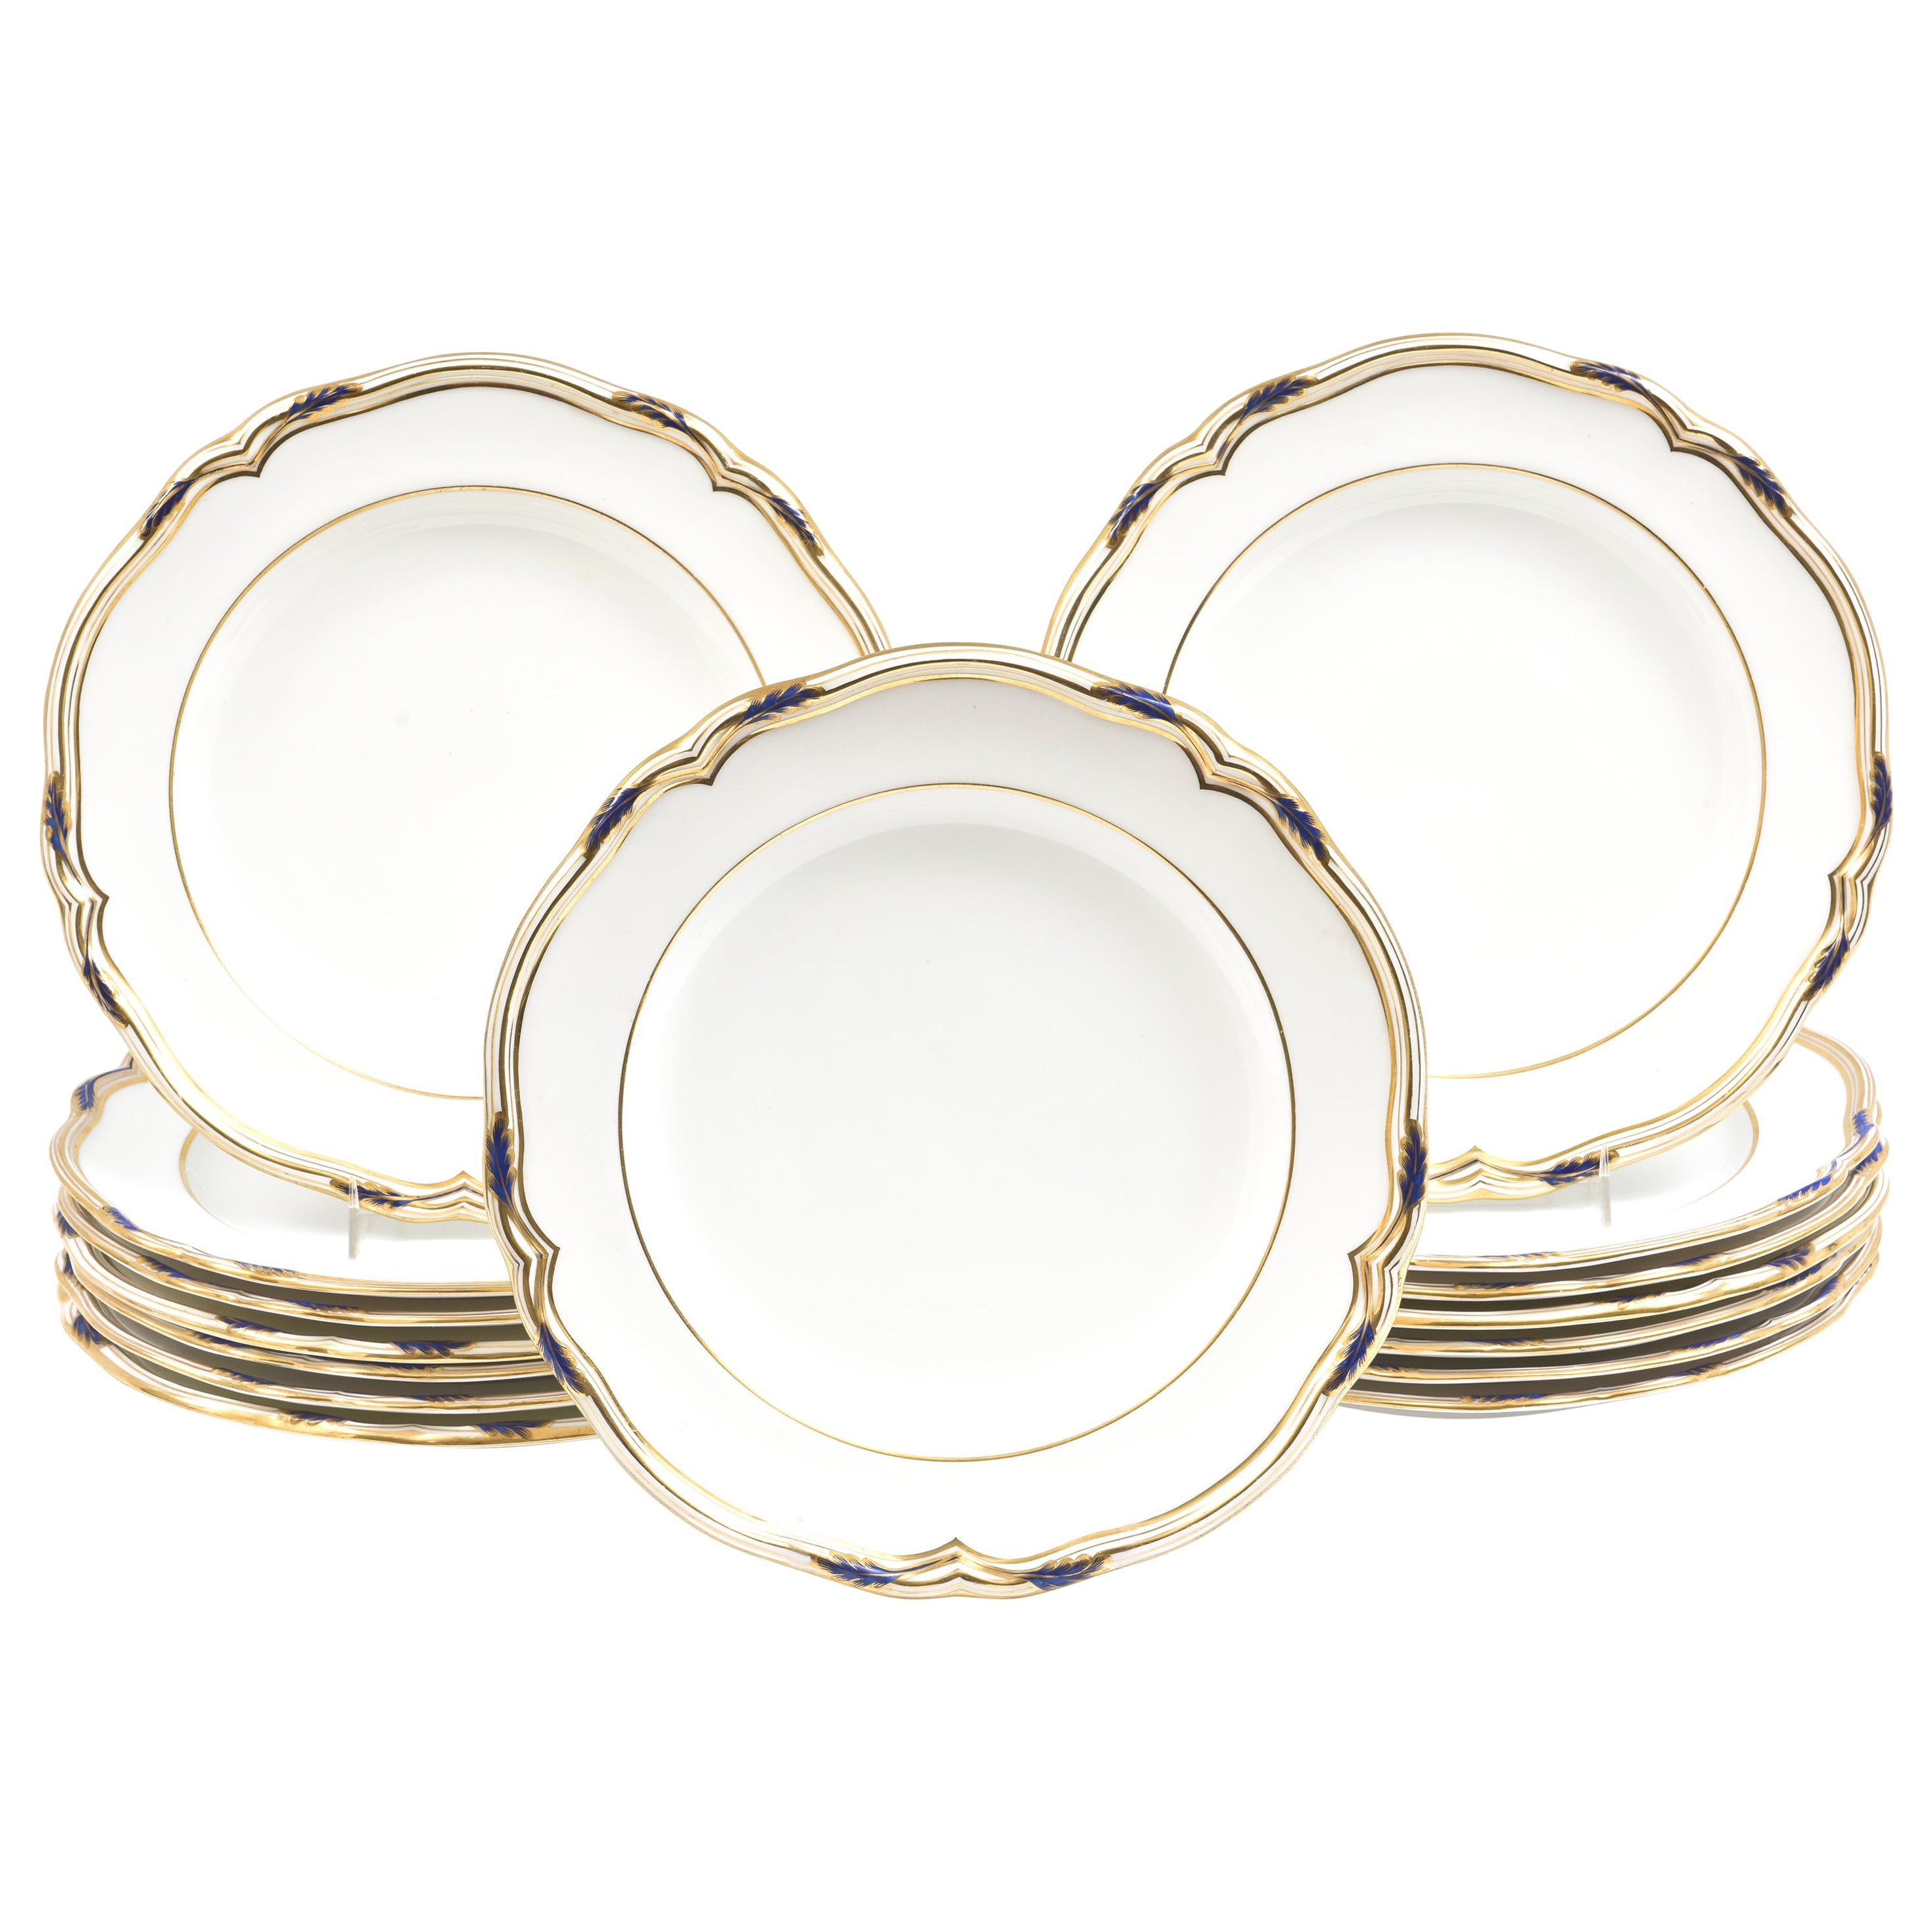 15 Antique Cobalt and Gold Dinner Plates, Spode, England Scalloped Shape Edge